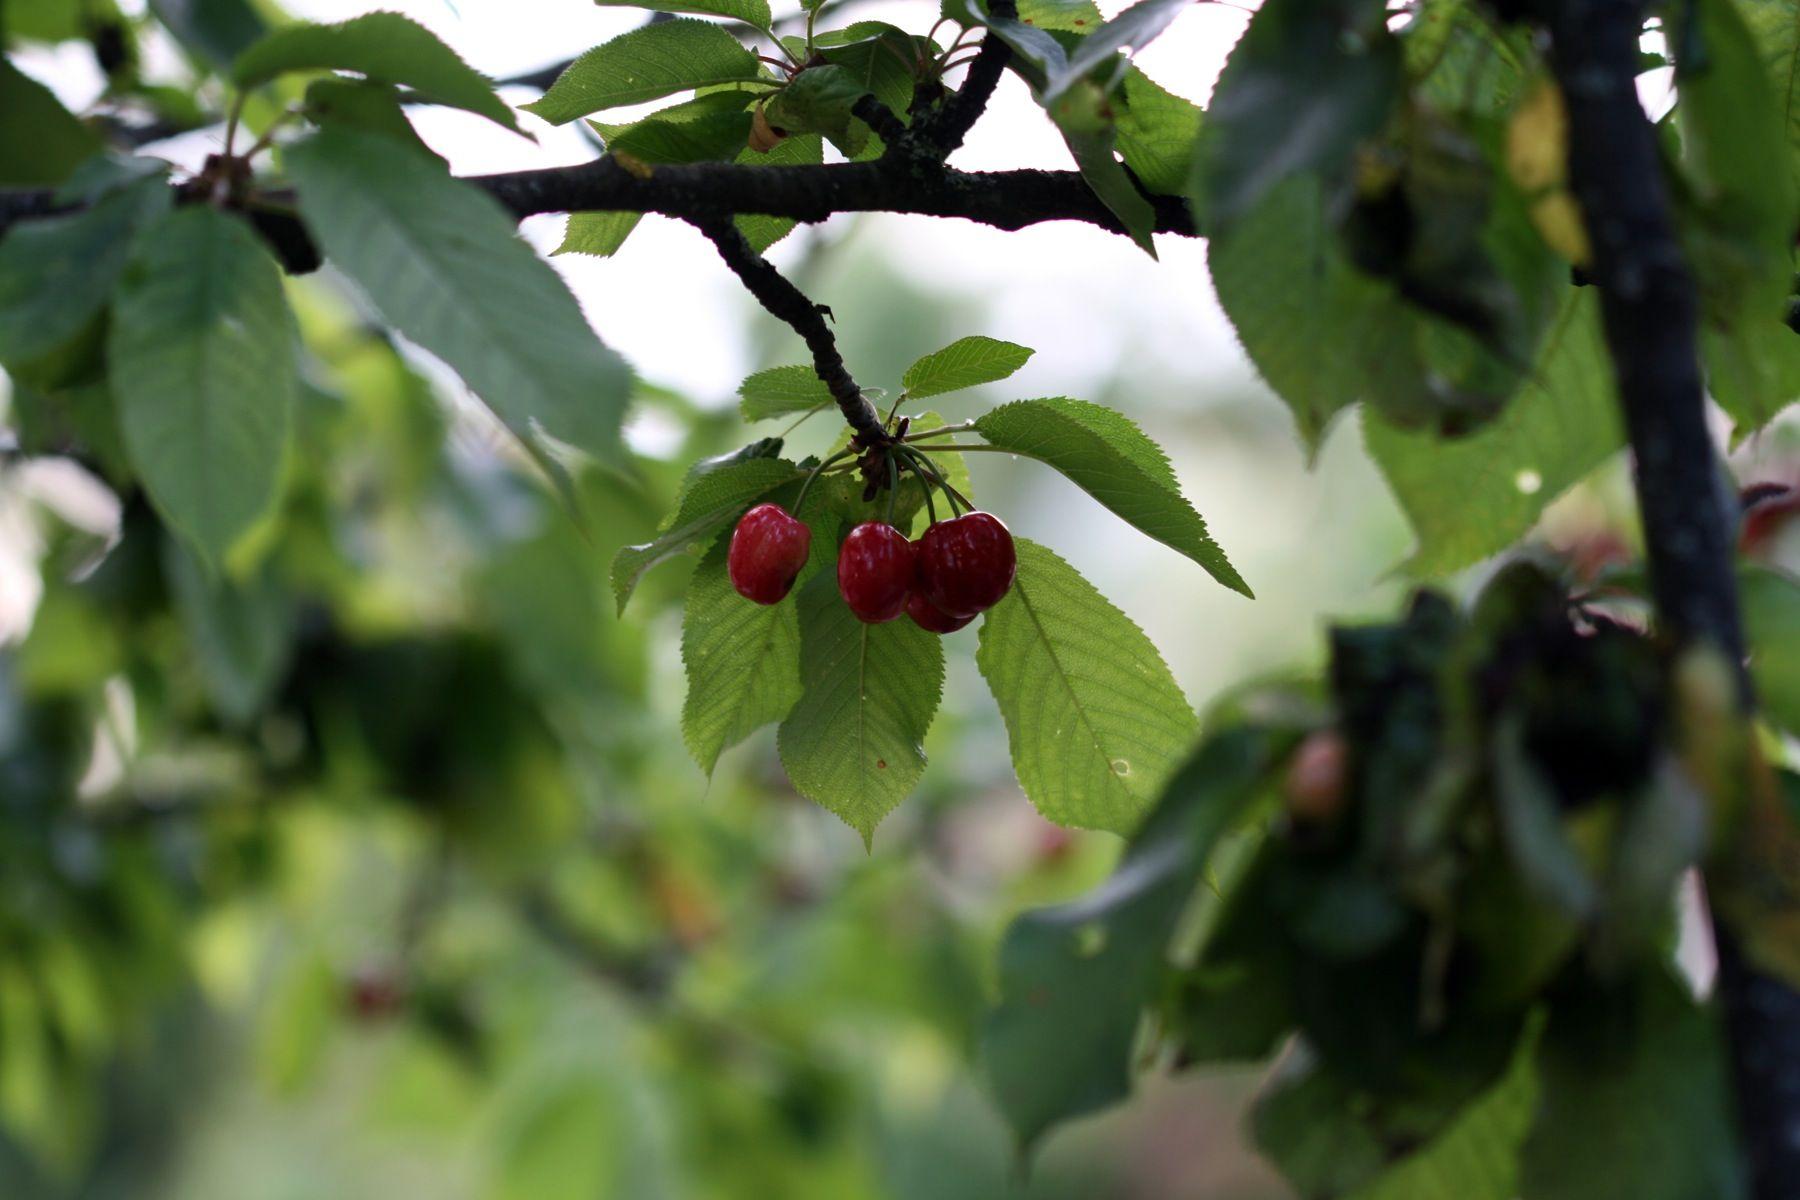 Equine Health Care In North Fl Gainesville Alachua Newberry Cherry Tree Cherry Tree Cherry Poisonous Plants